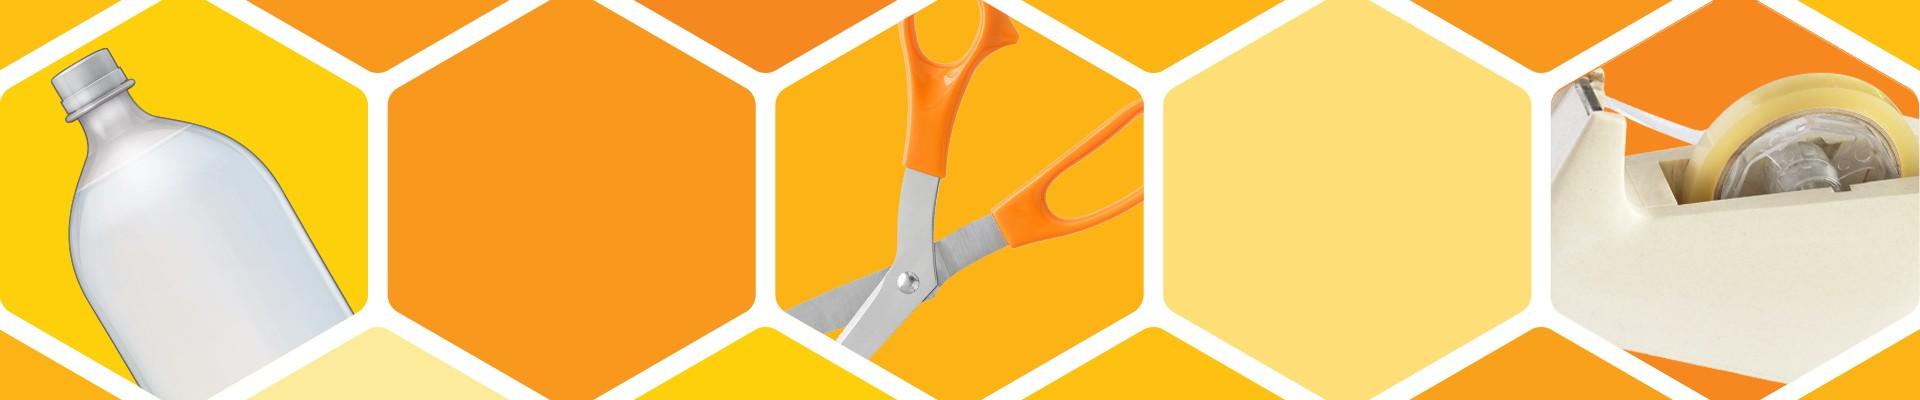 hexagon-pattern-2-liter-scissors-and-tape